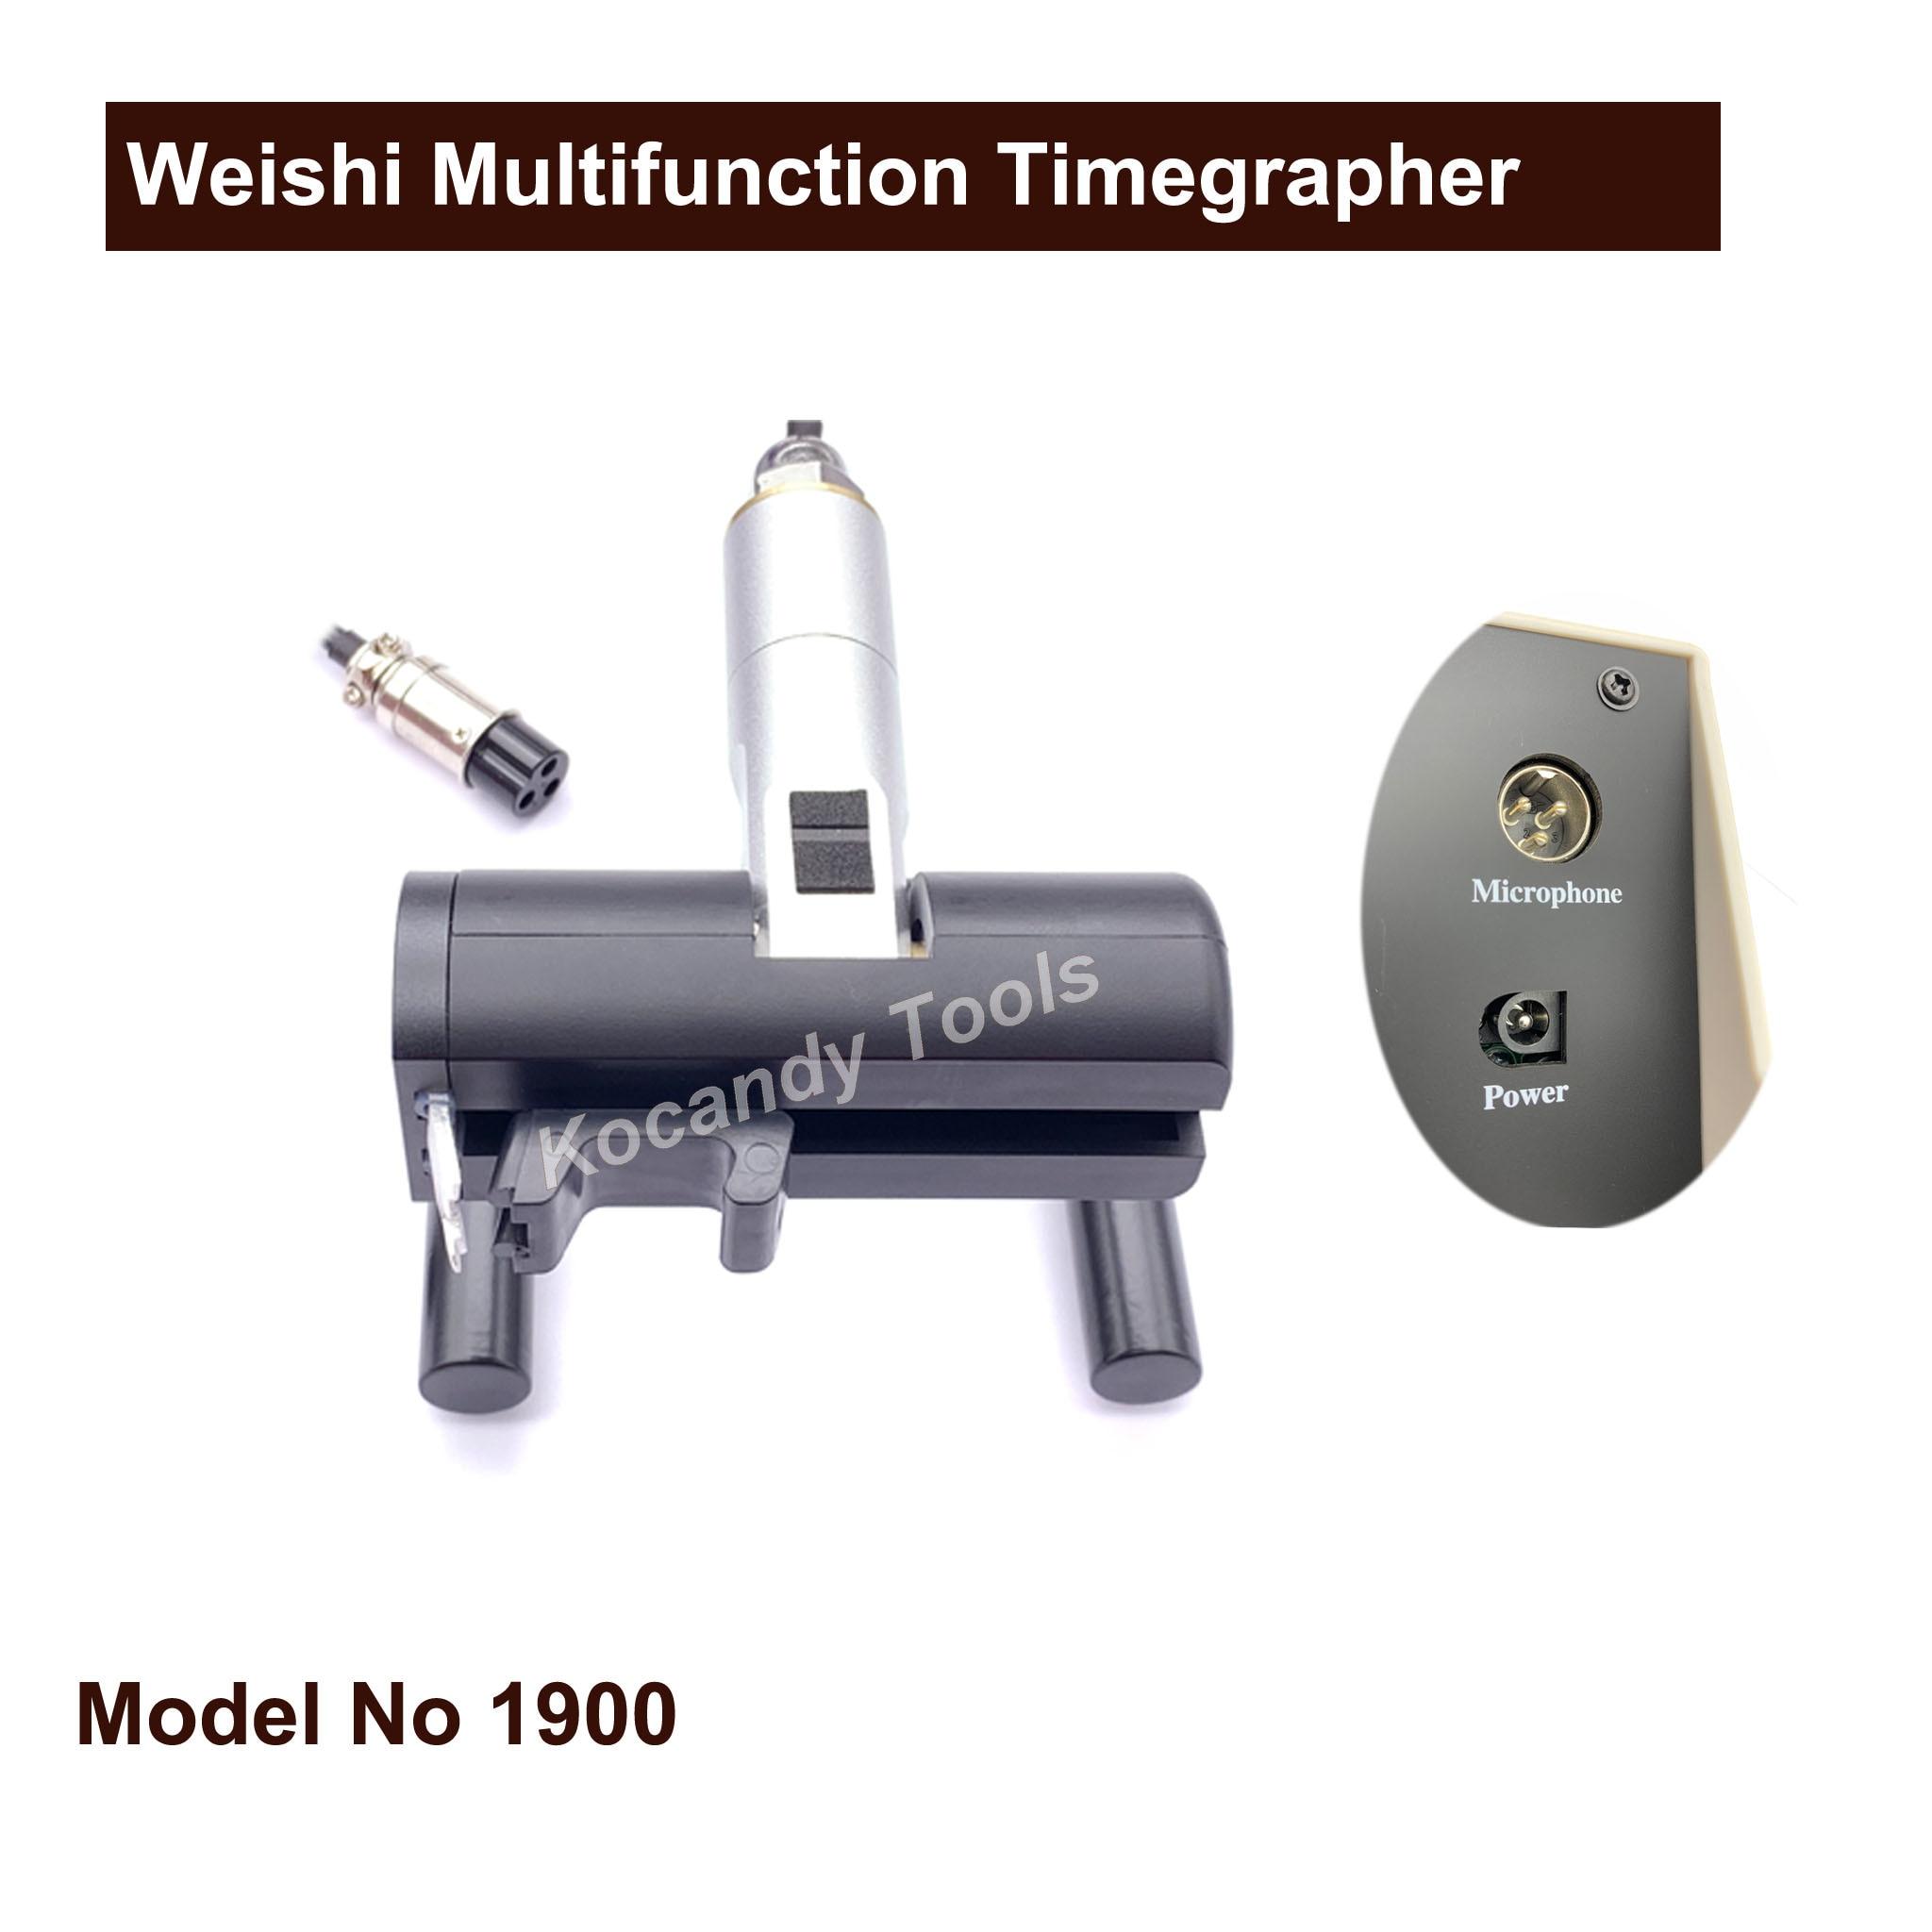 Weishi 1900 Multifunction Timegrapher, Professional Watch Timing 기계 Multifunction Timegrapher 대 한 시계 제조 Repair 툴-에서수리 도구 & 키트부터 시계 의  그룹 2